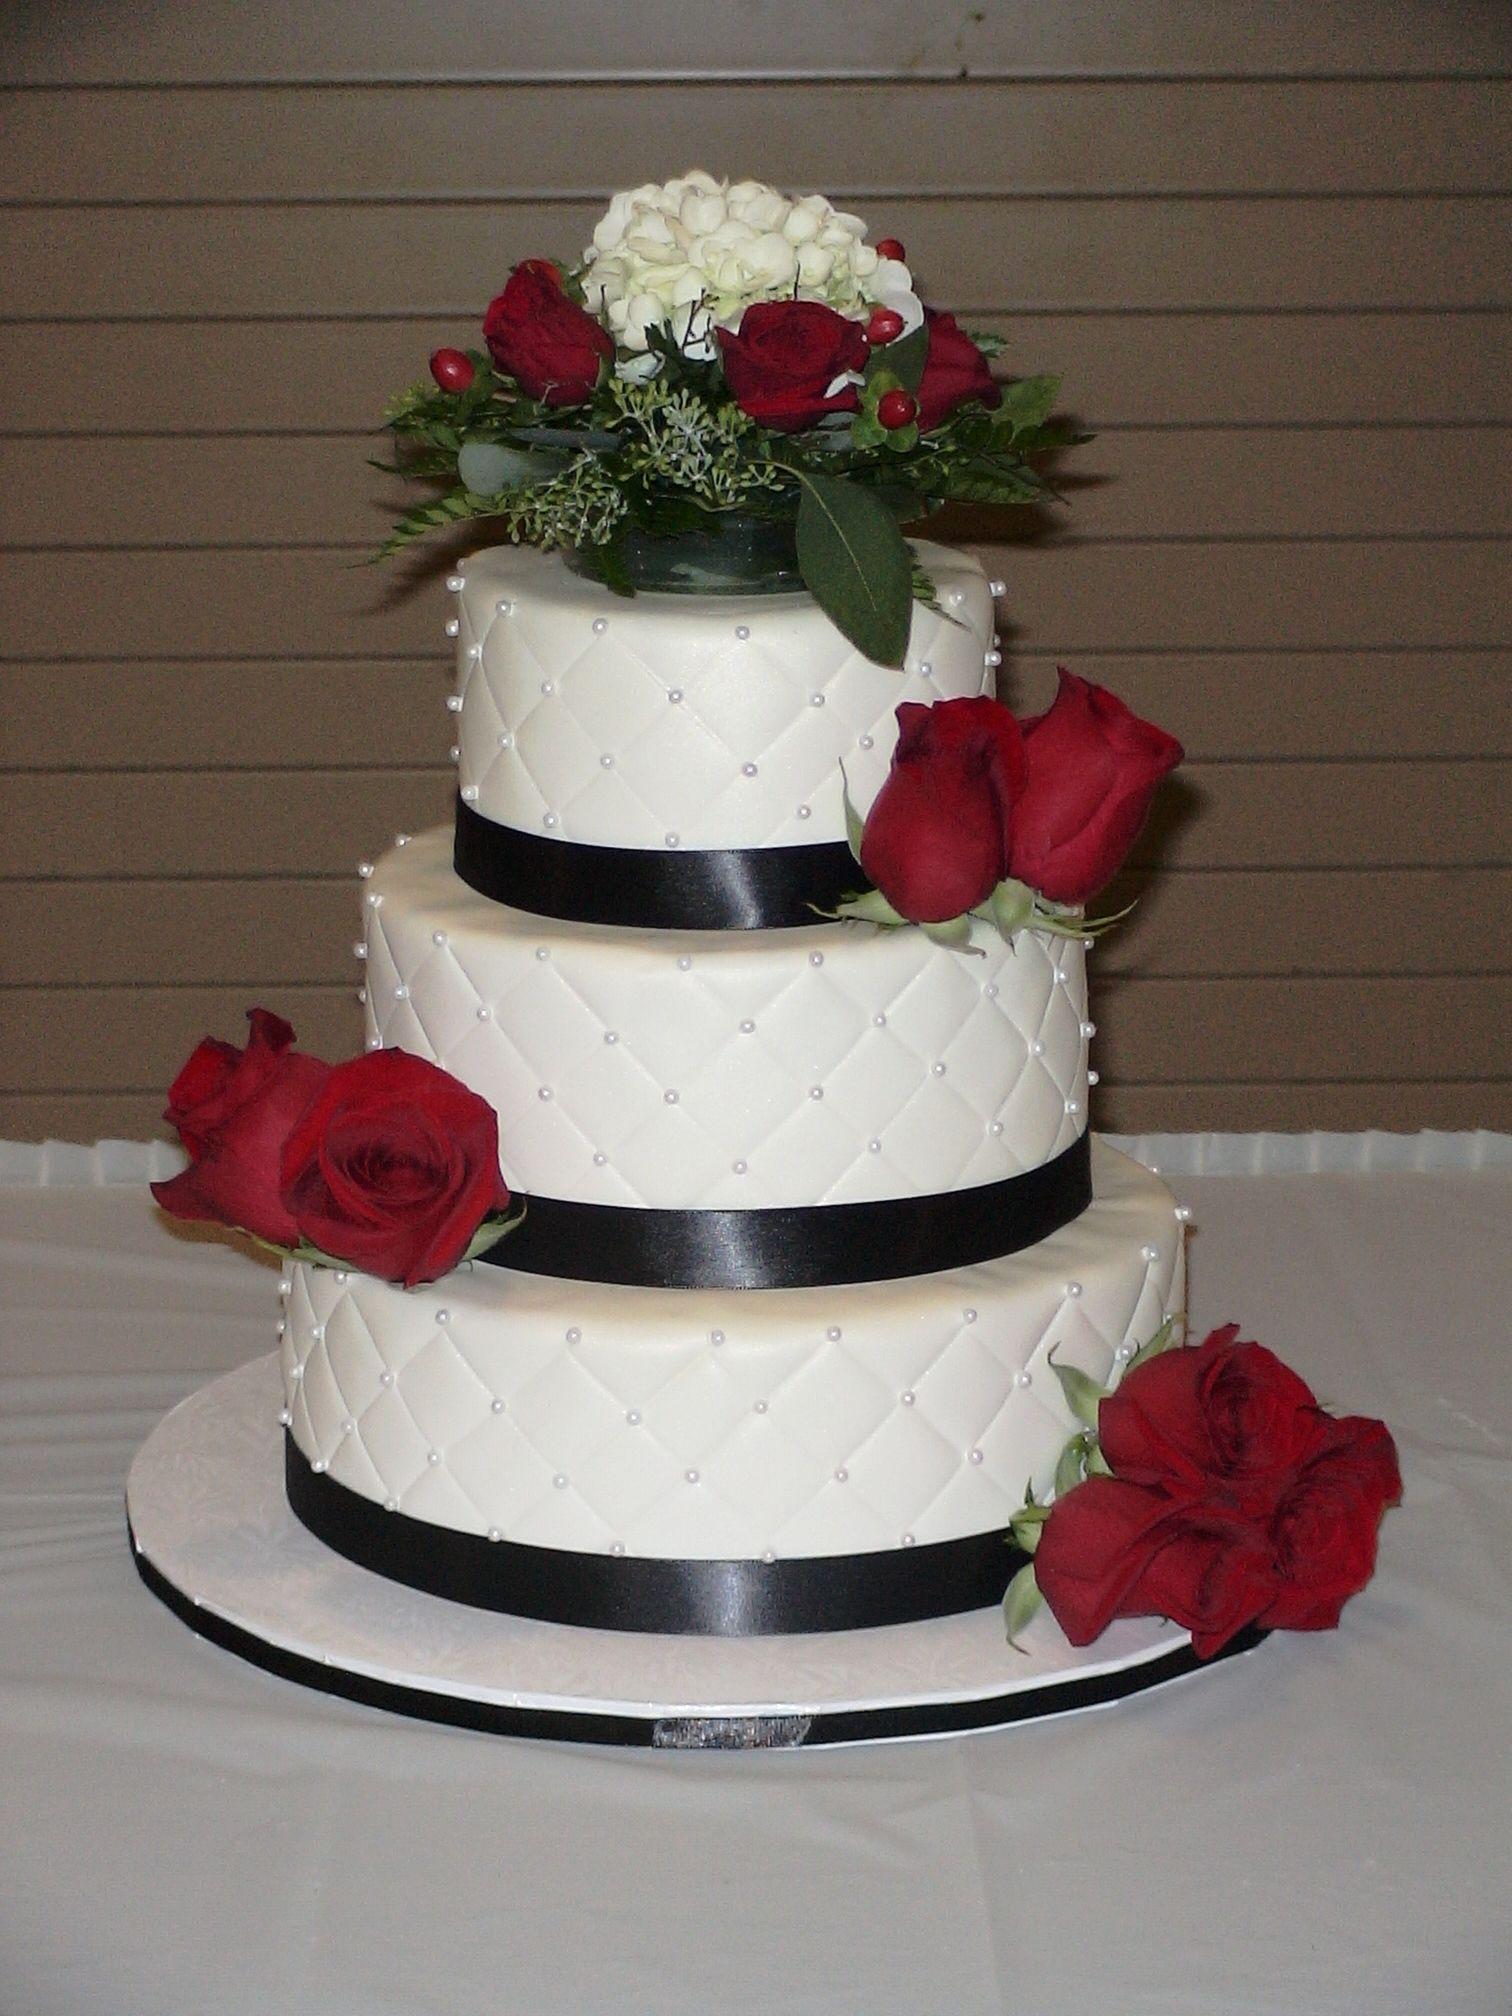 Quilted Fondant Wedding Cake